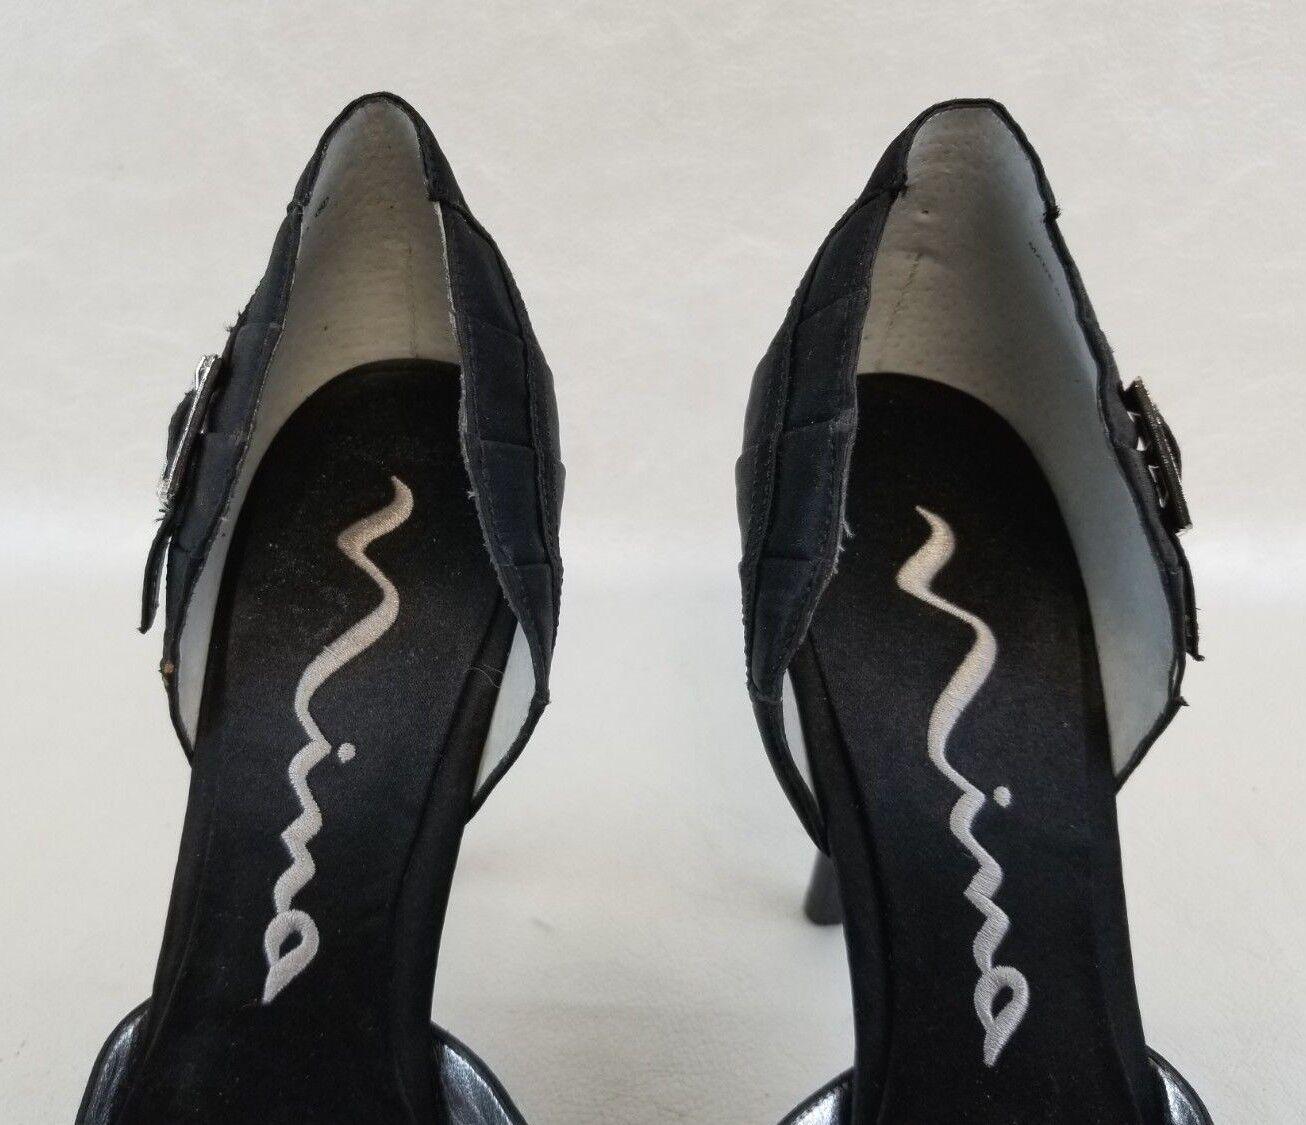 Nina Black Satin Satin Satin Fabric Rhinestone Buckle Heels Womens Pointy Toe shoes Size 9 d20164